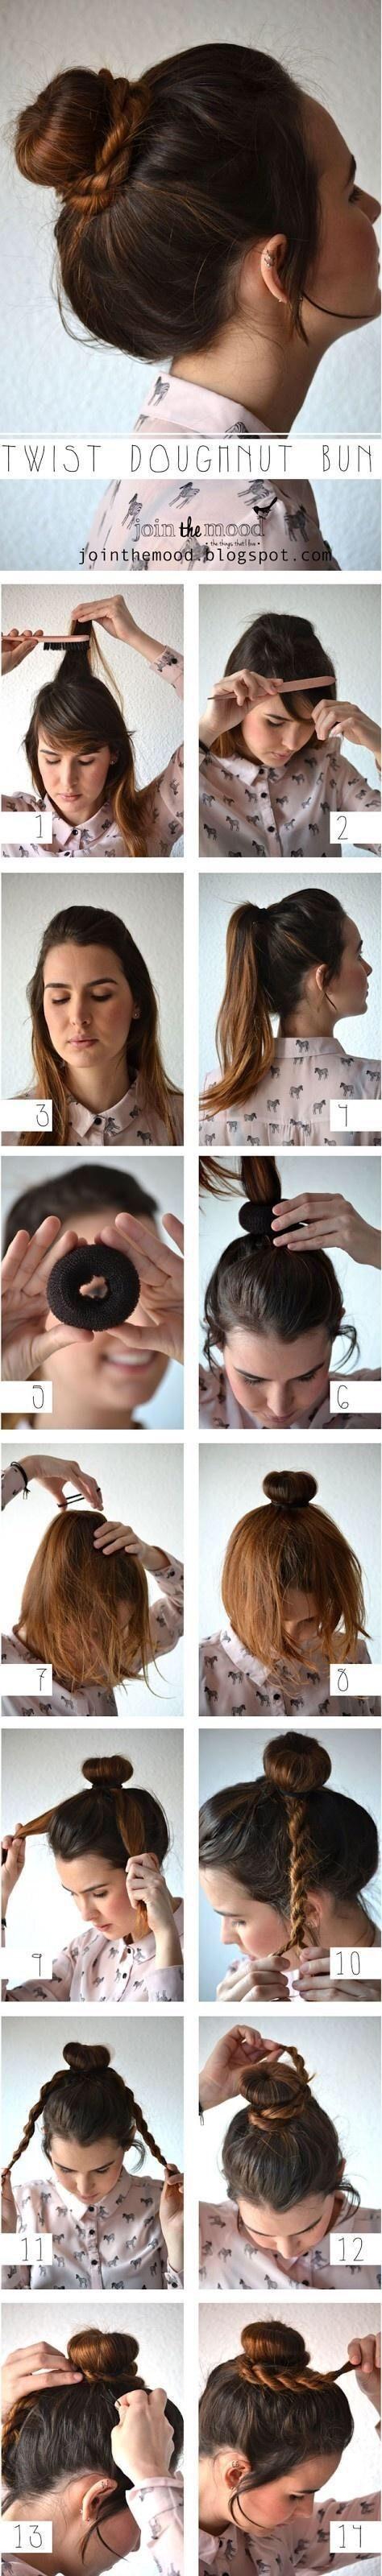 Imagen vía We Heart It https://weheartit.com/entry/59363128/via/2053948 #blonde #brunette #diy #fashion #hair #ombre #tutorial #diyideas #diyfashionideas #diyfashionprojects #diyfashiontips